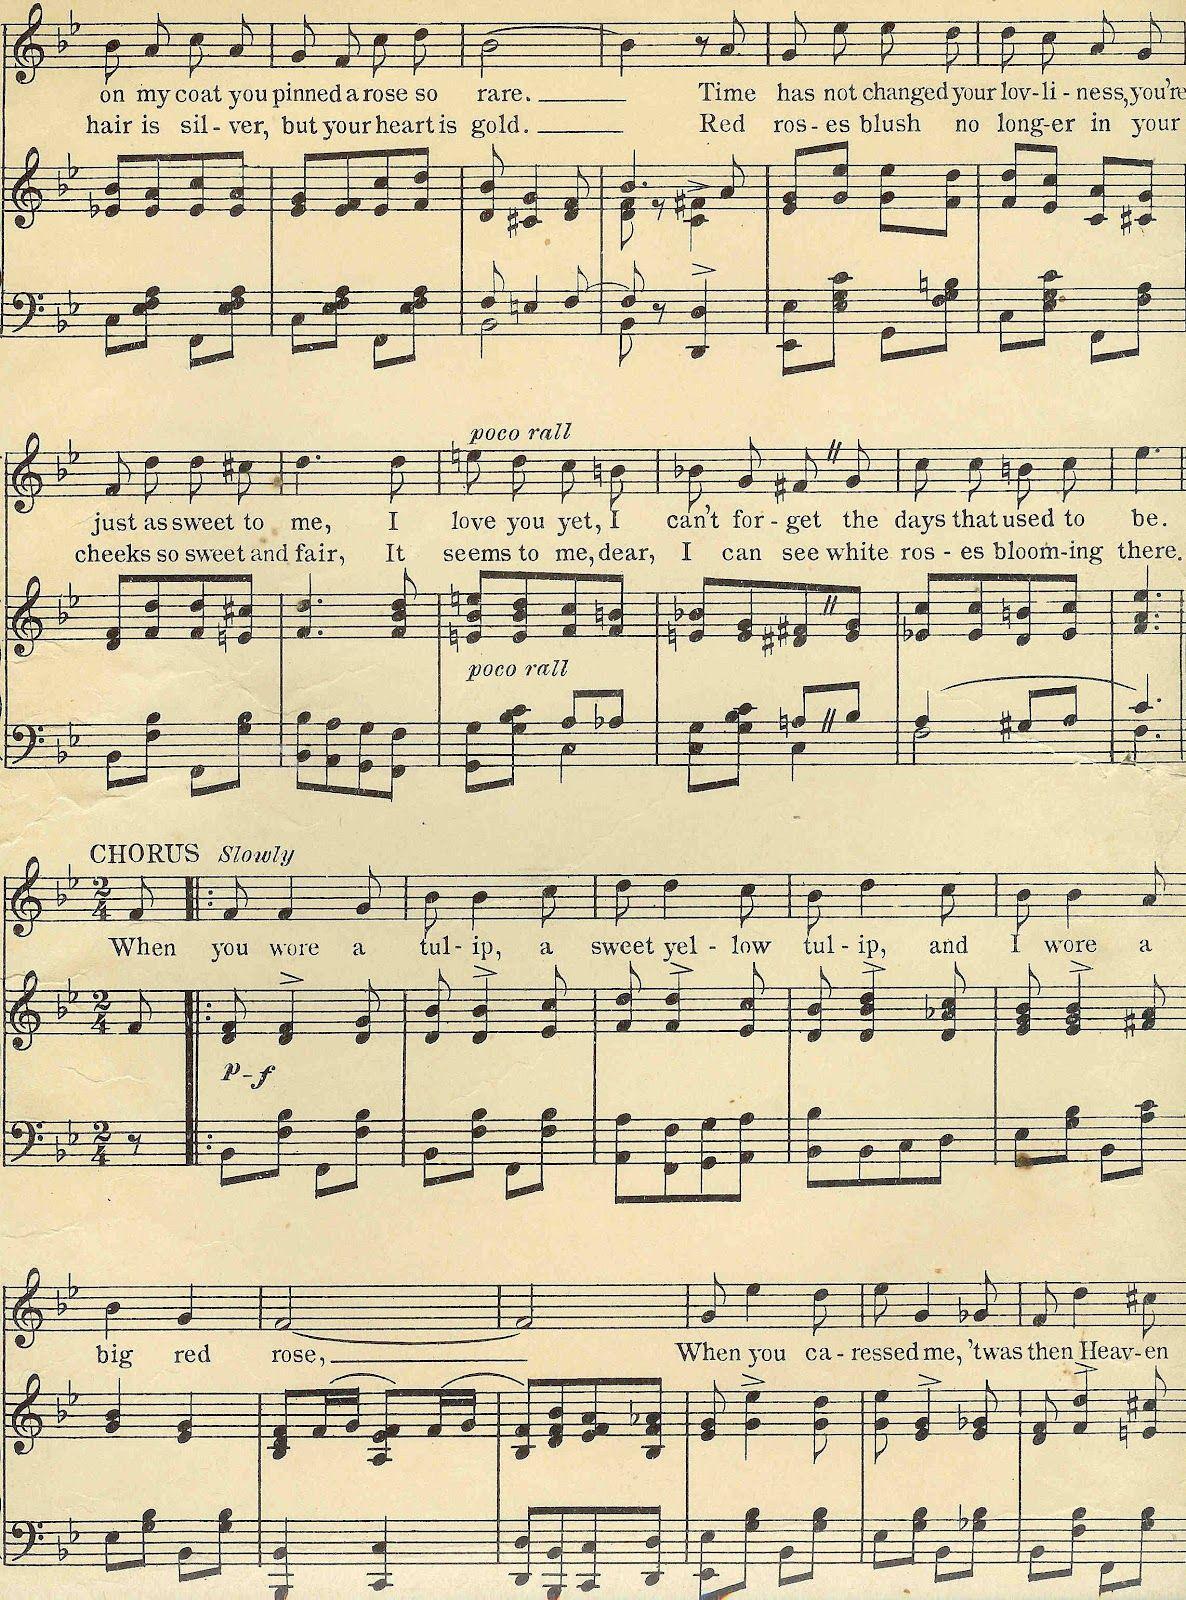 Digital Background Of Sheet Music Vintage Sheet Music Clip Art